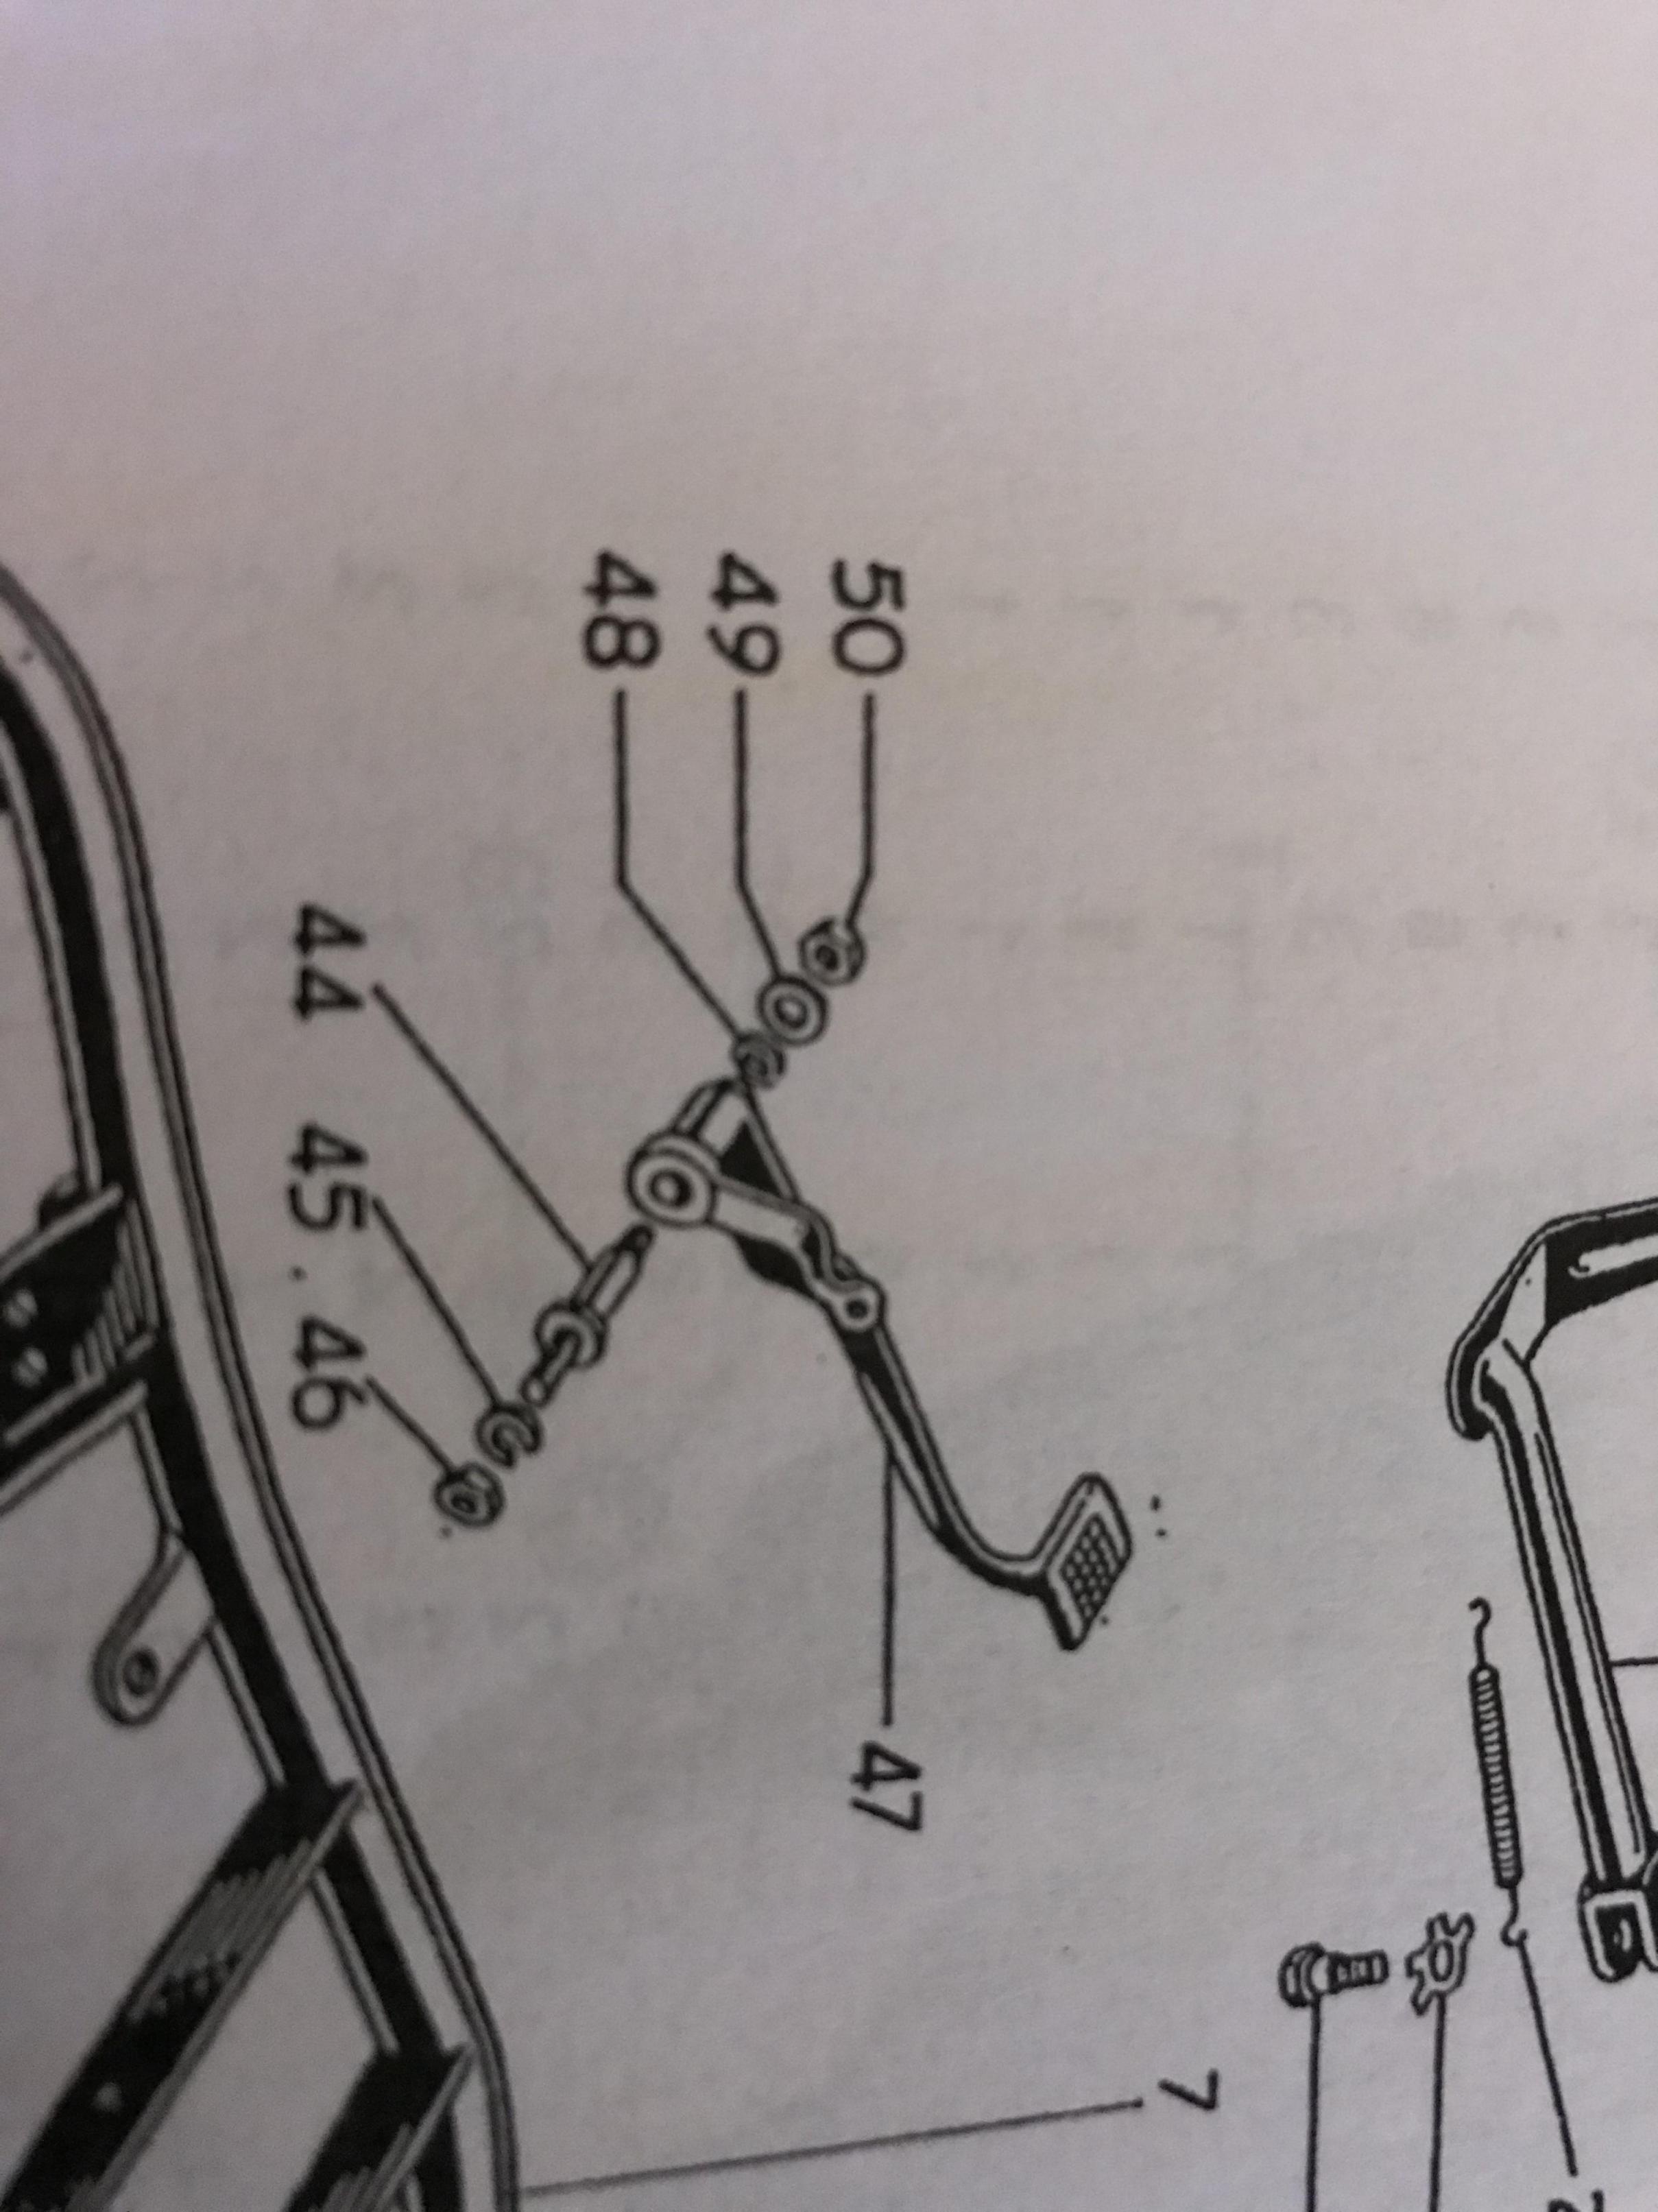 1965 Tiger 90 - Rear Brake Pedal Spindle-204f0ab8-f533-4d24-a70a-ff181129f9af_1566420736127.jpg